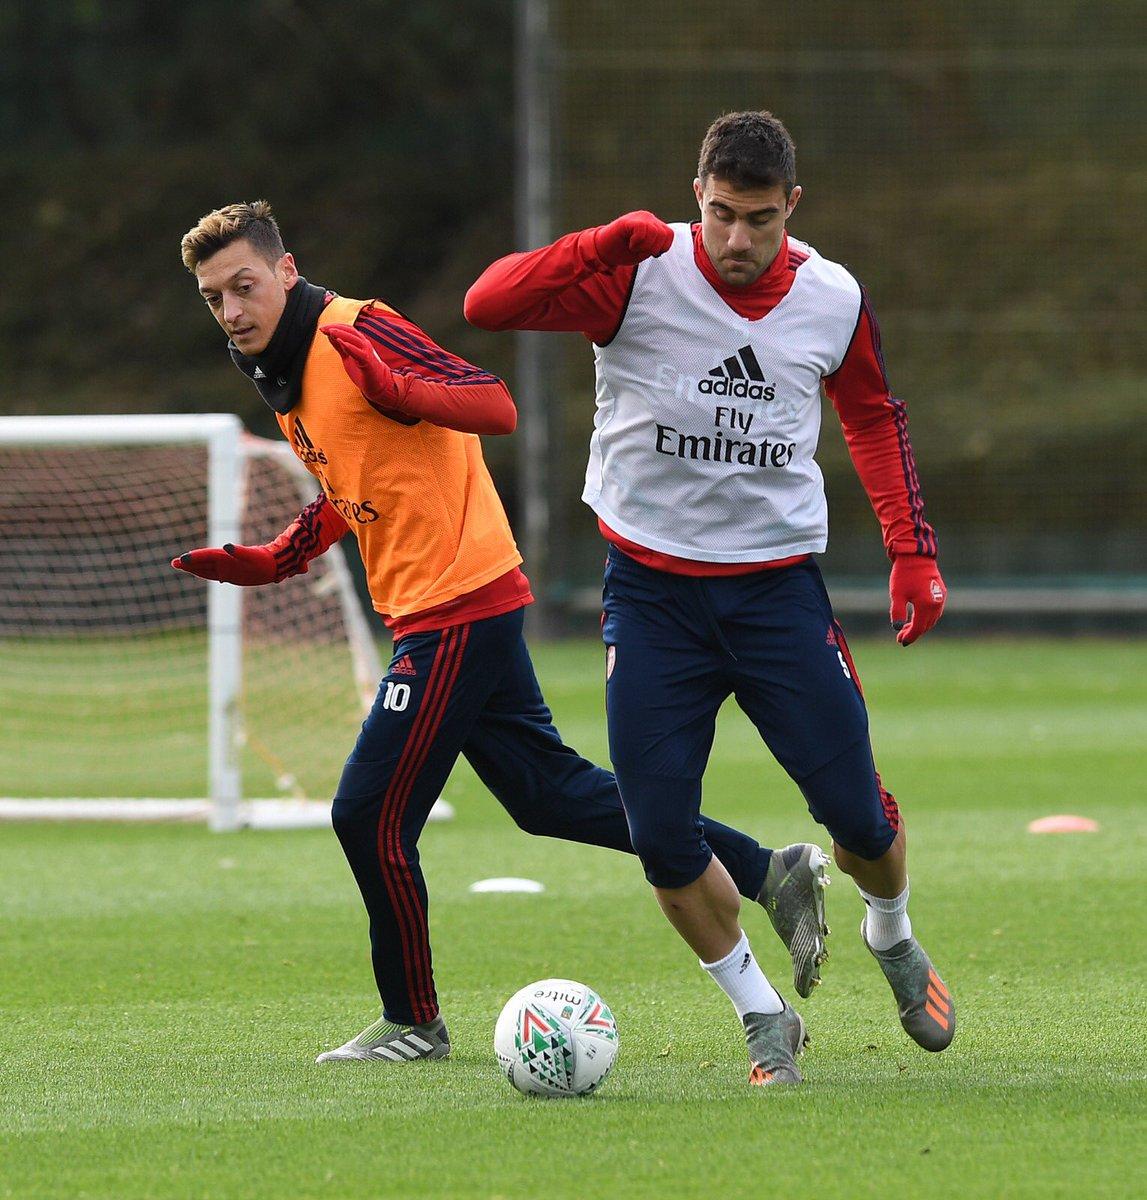 Training done ✅ @Arsenal #CarabaoCup #LIVARS